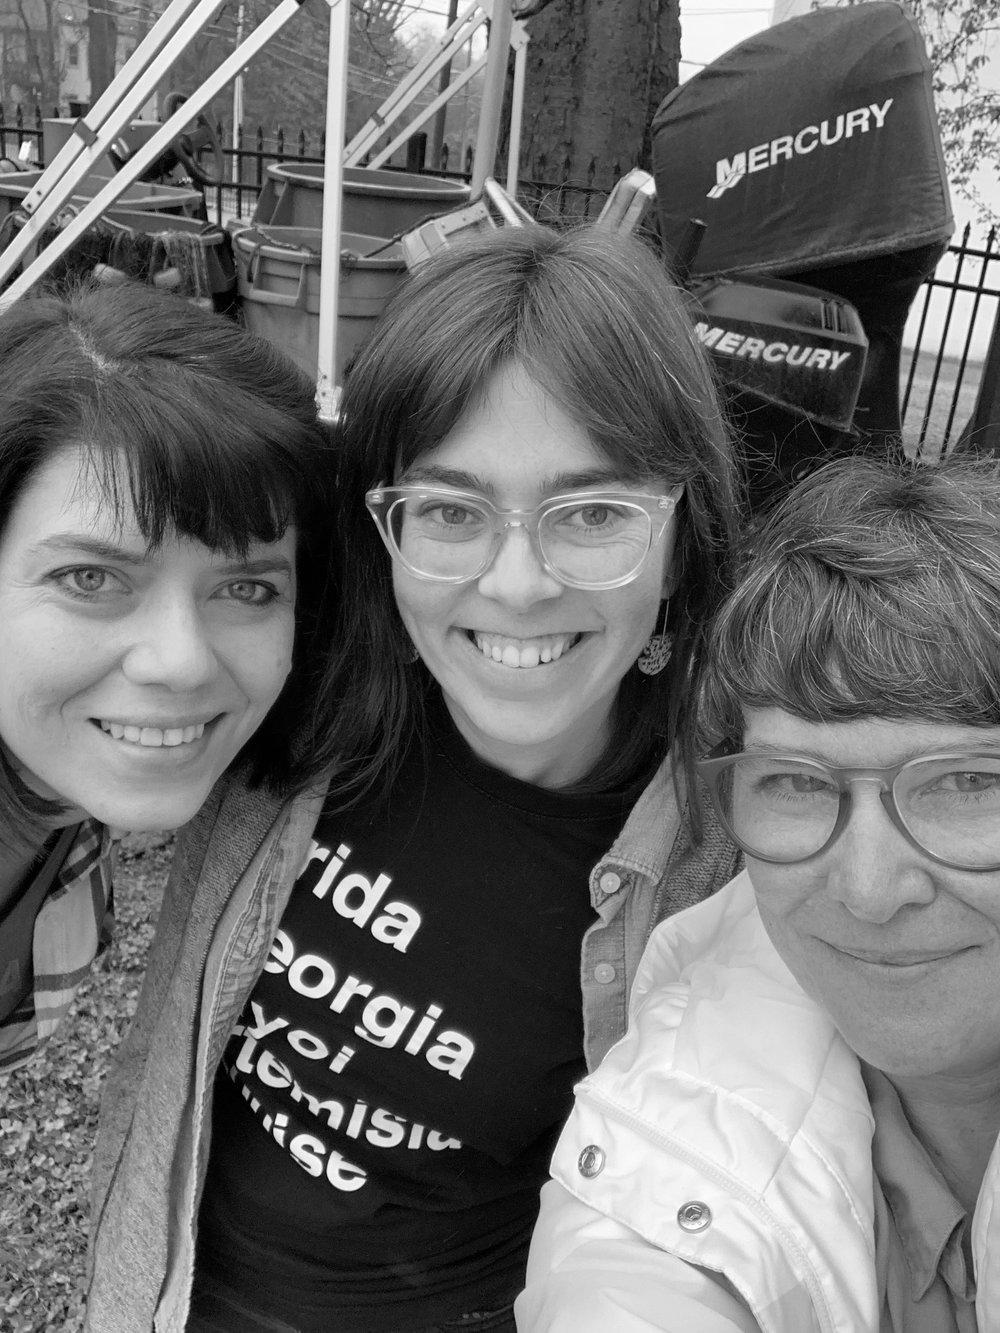 Left to right: Meredith Lynn, Katie Hargrave & Vivian Liddell